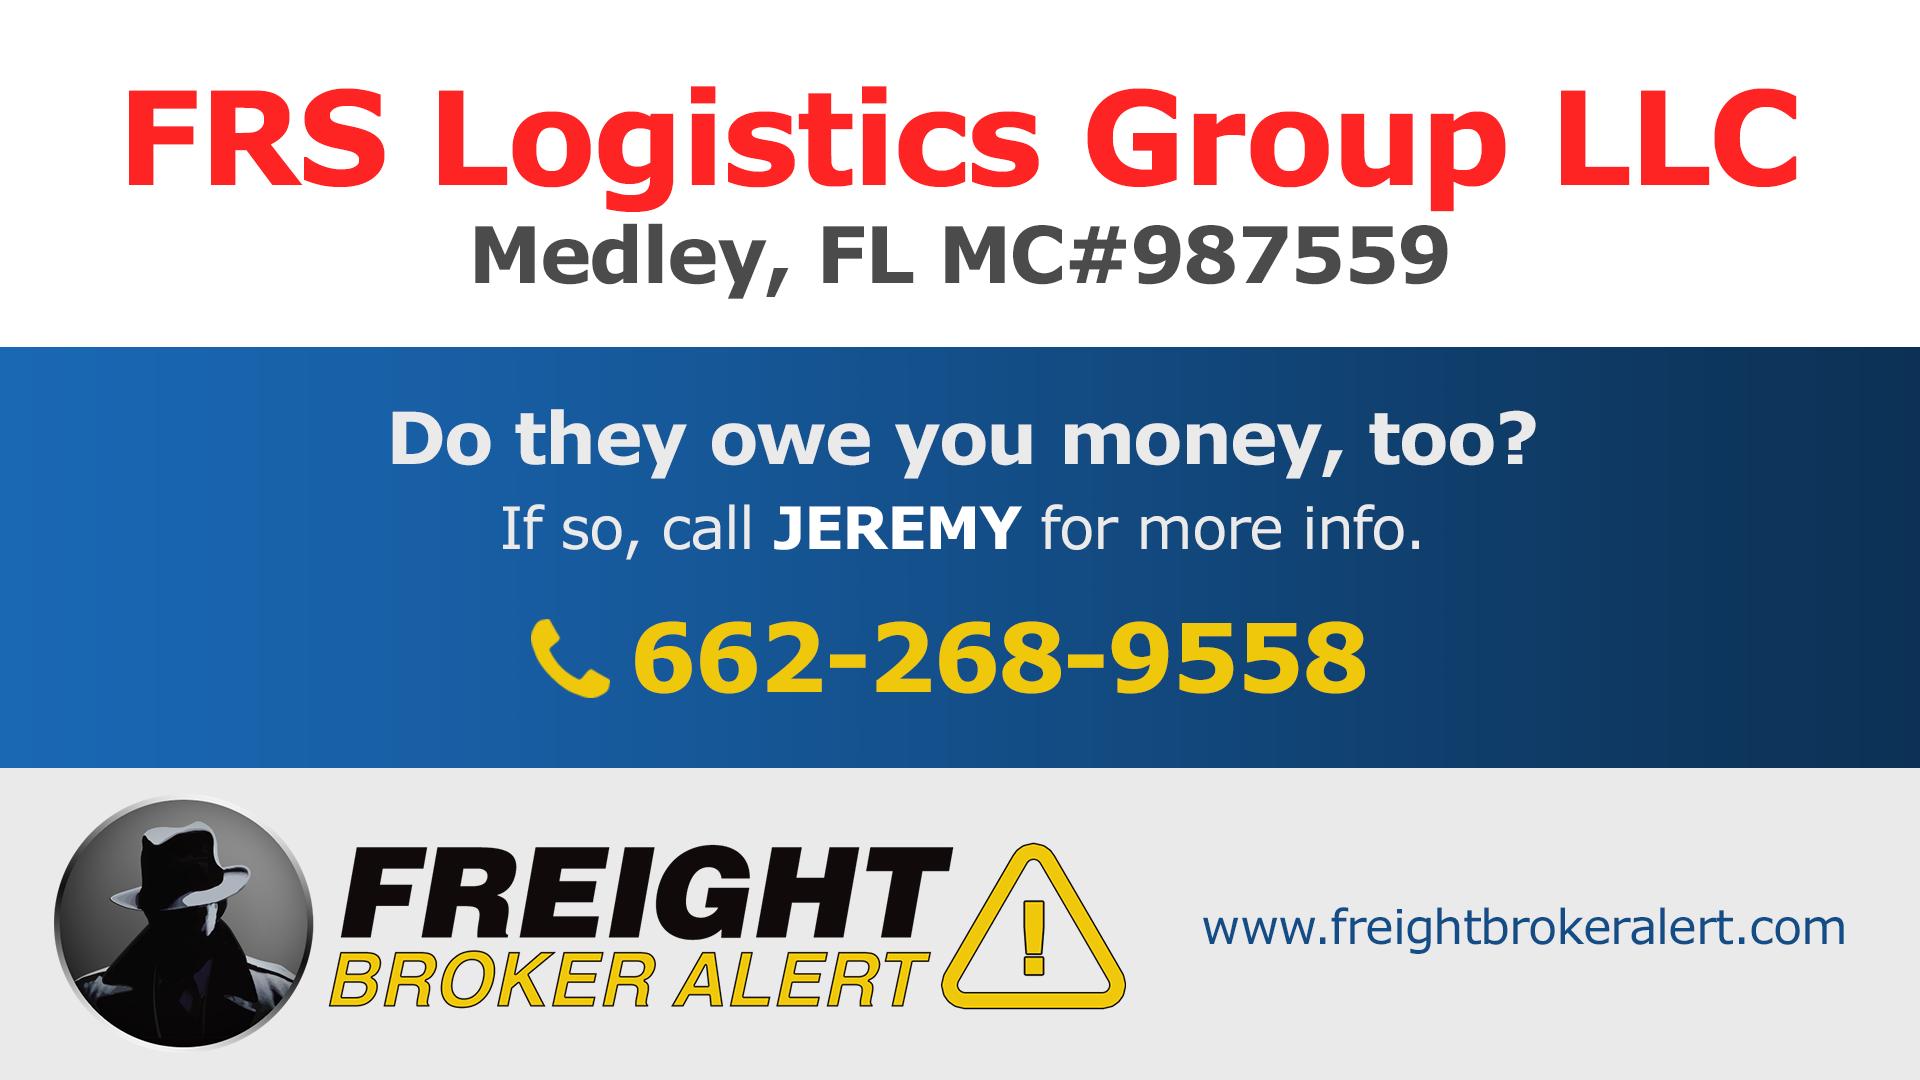 FRS Logistics Group LLC Florida